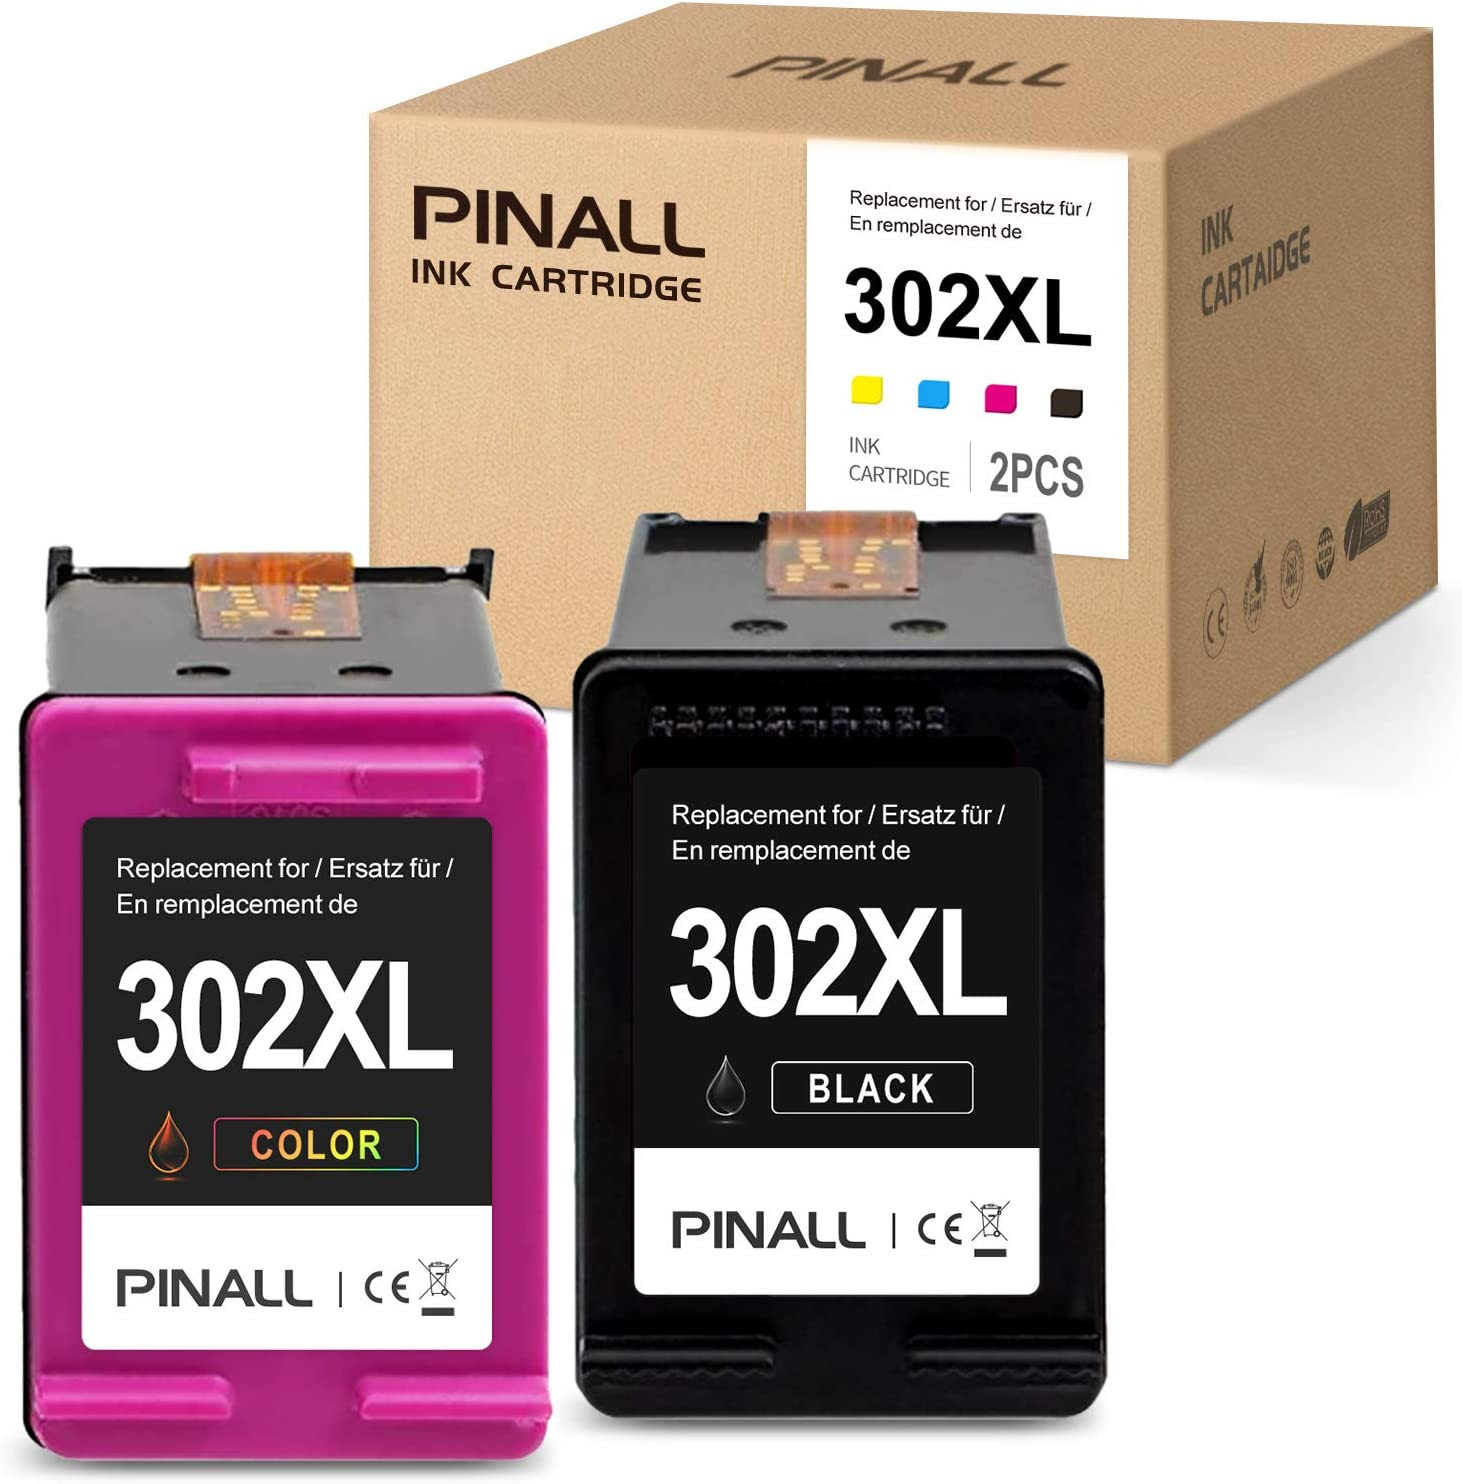 PINALL 2 Cartucho Compatible HP 302XL para HP DeskJet 3639 3630 OfficeJet 3831 3830 3833 OfficeJet 5230 5232 4655 4650Envy 4525 4500 4520 Impresora (1 Negro / 1 Color): Amazon.es: Electrónica